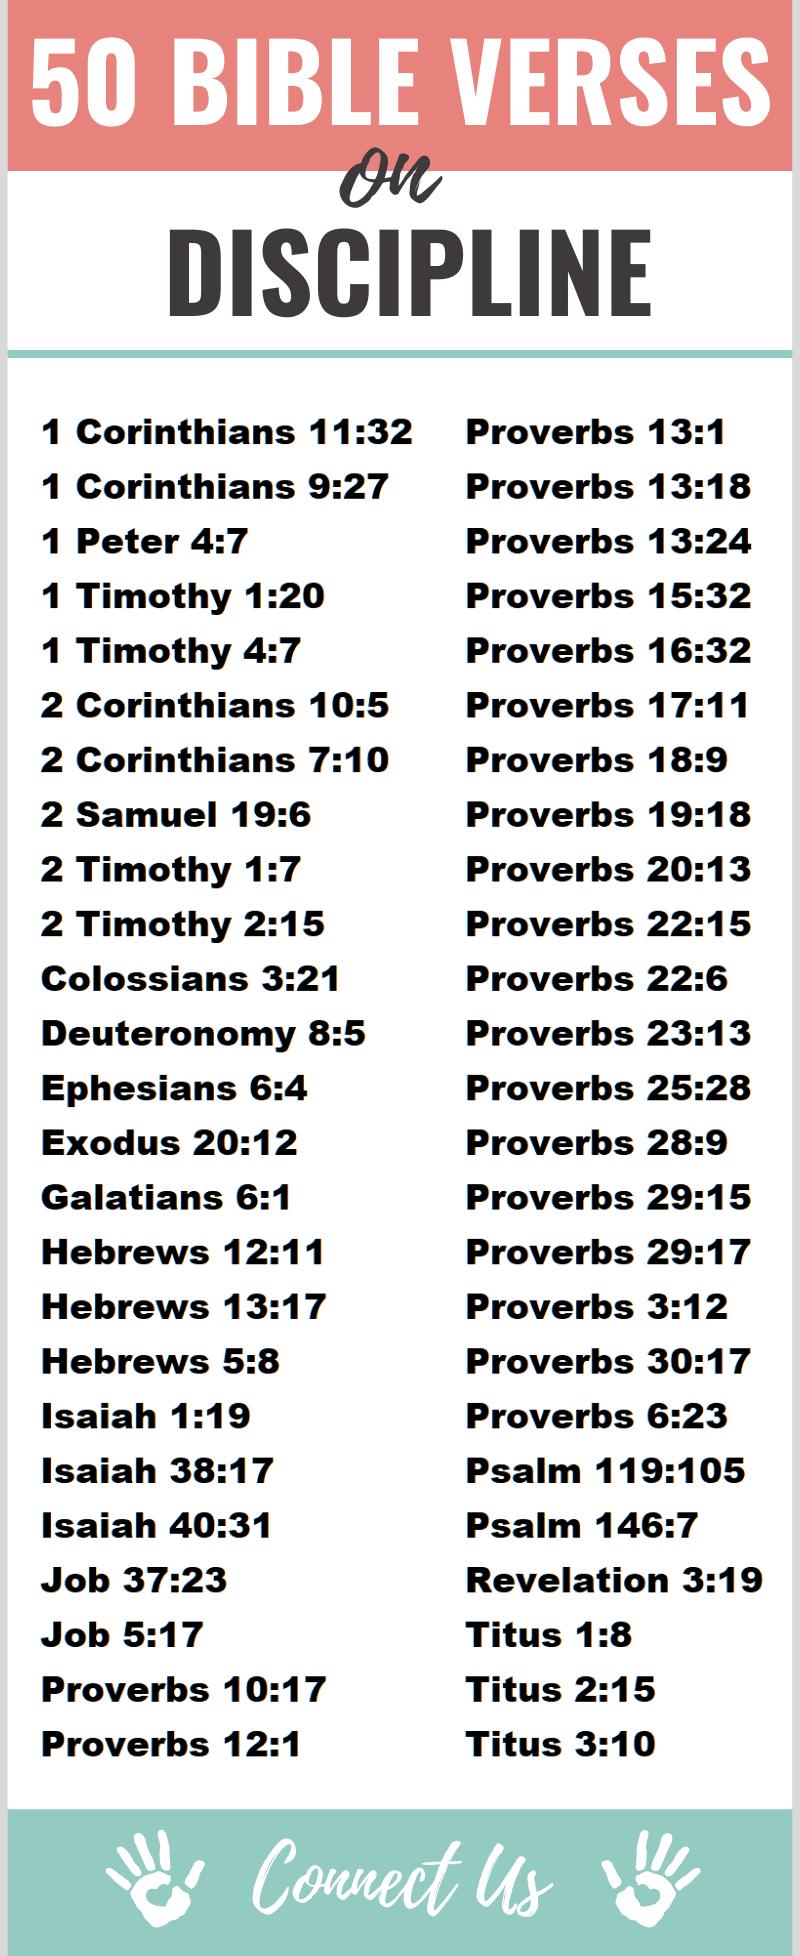 Bible Verses on Discipline